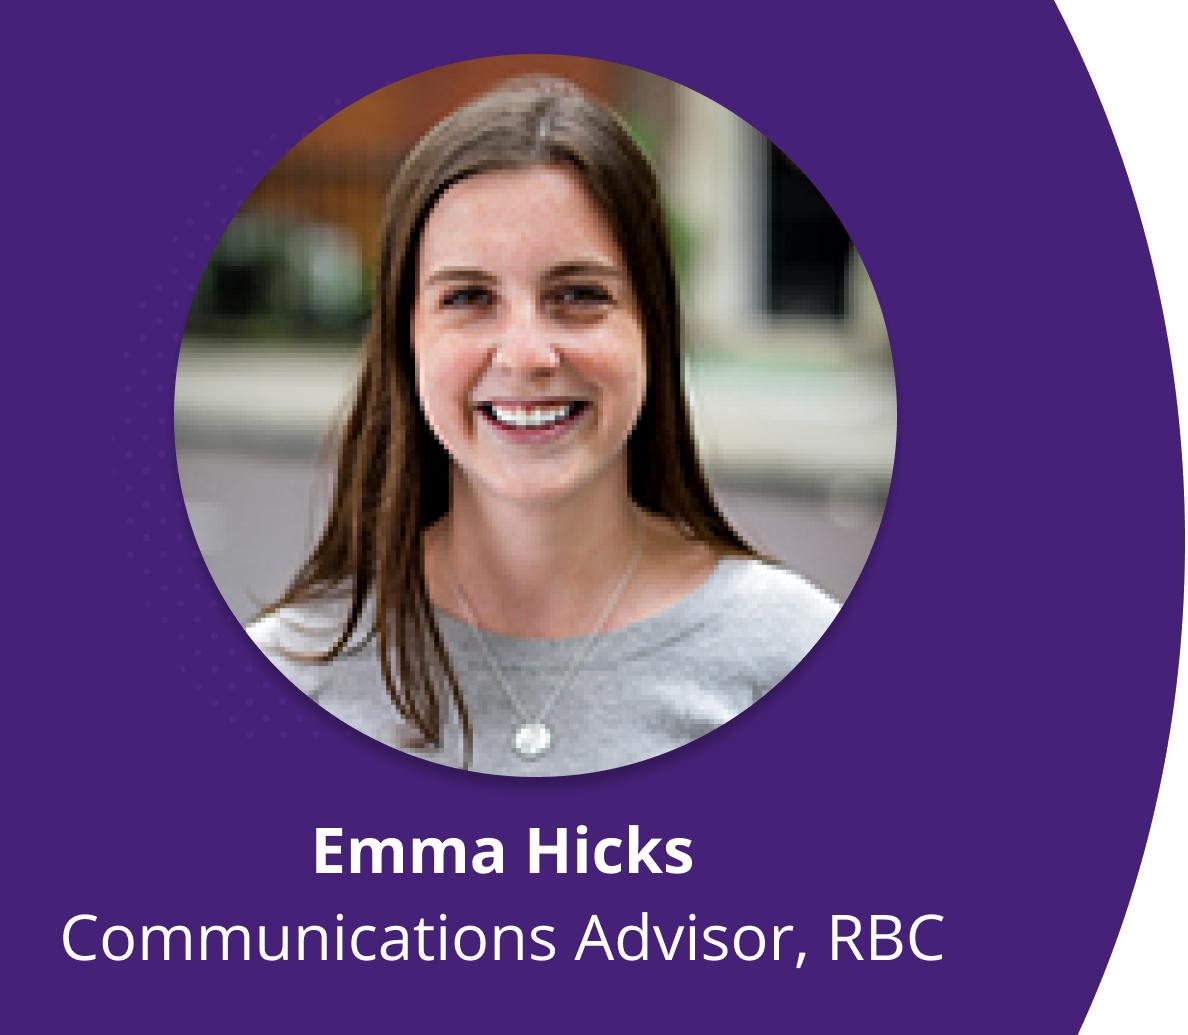 Emma Hicks Communications Advisor, RBC